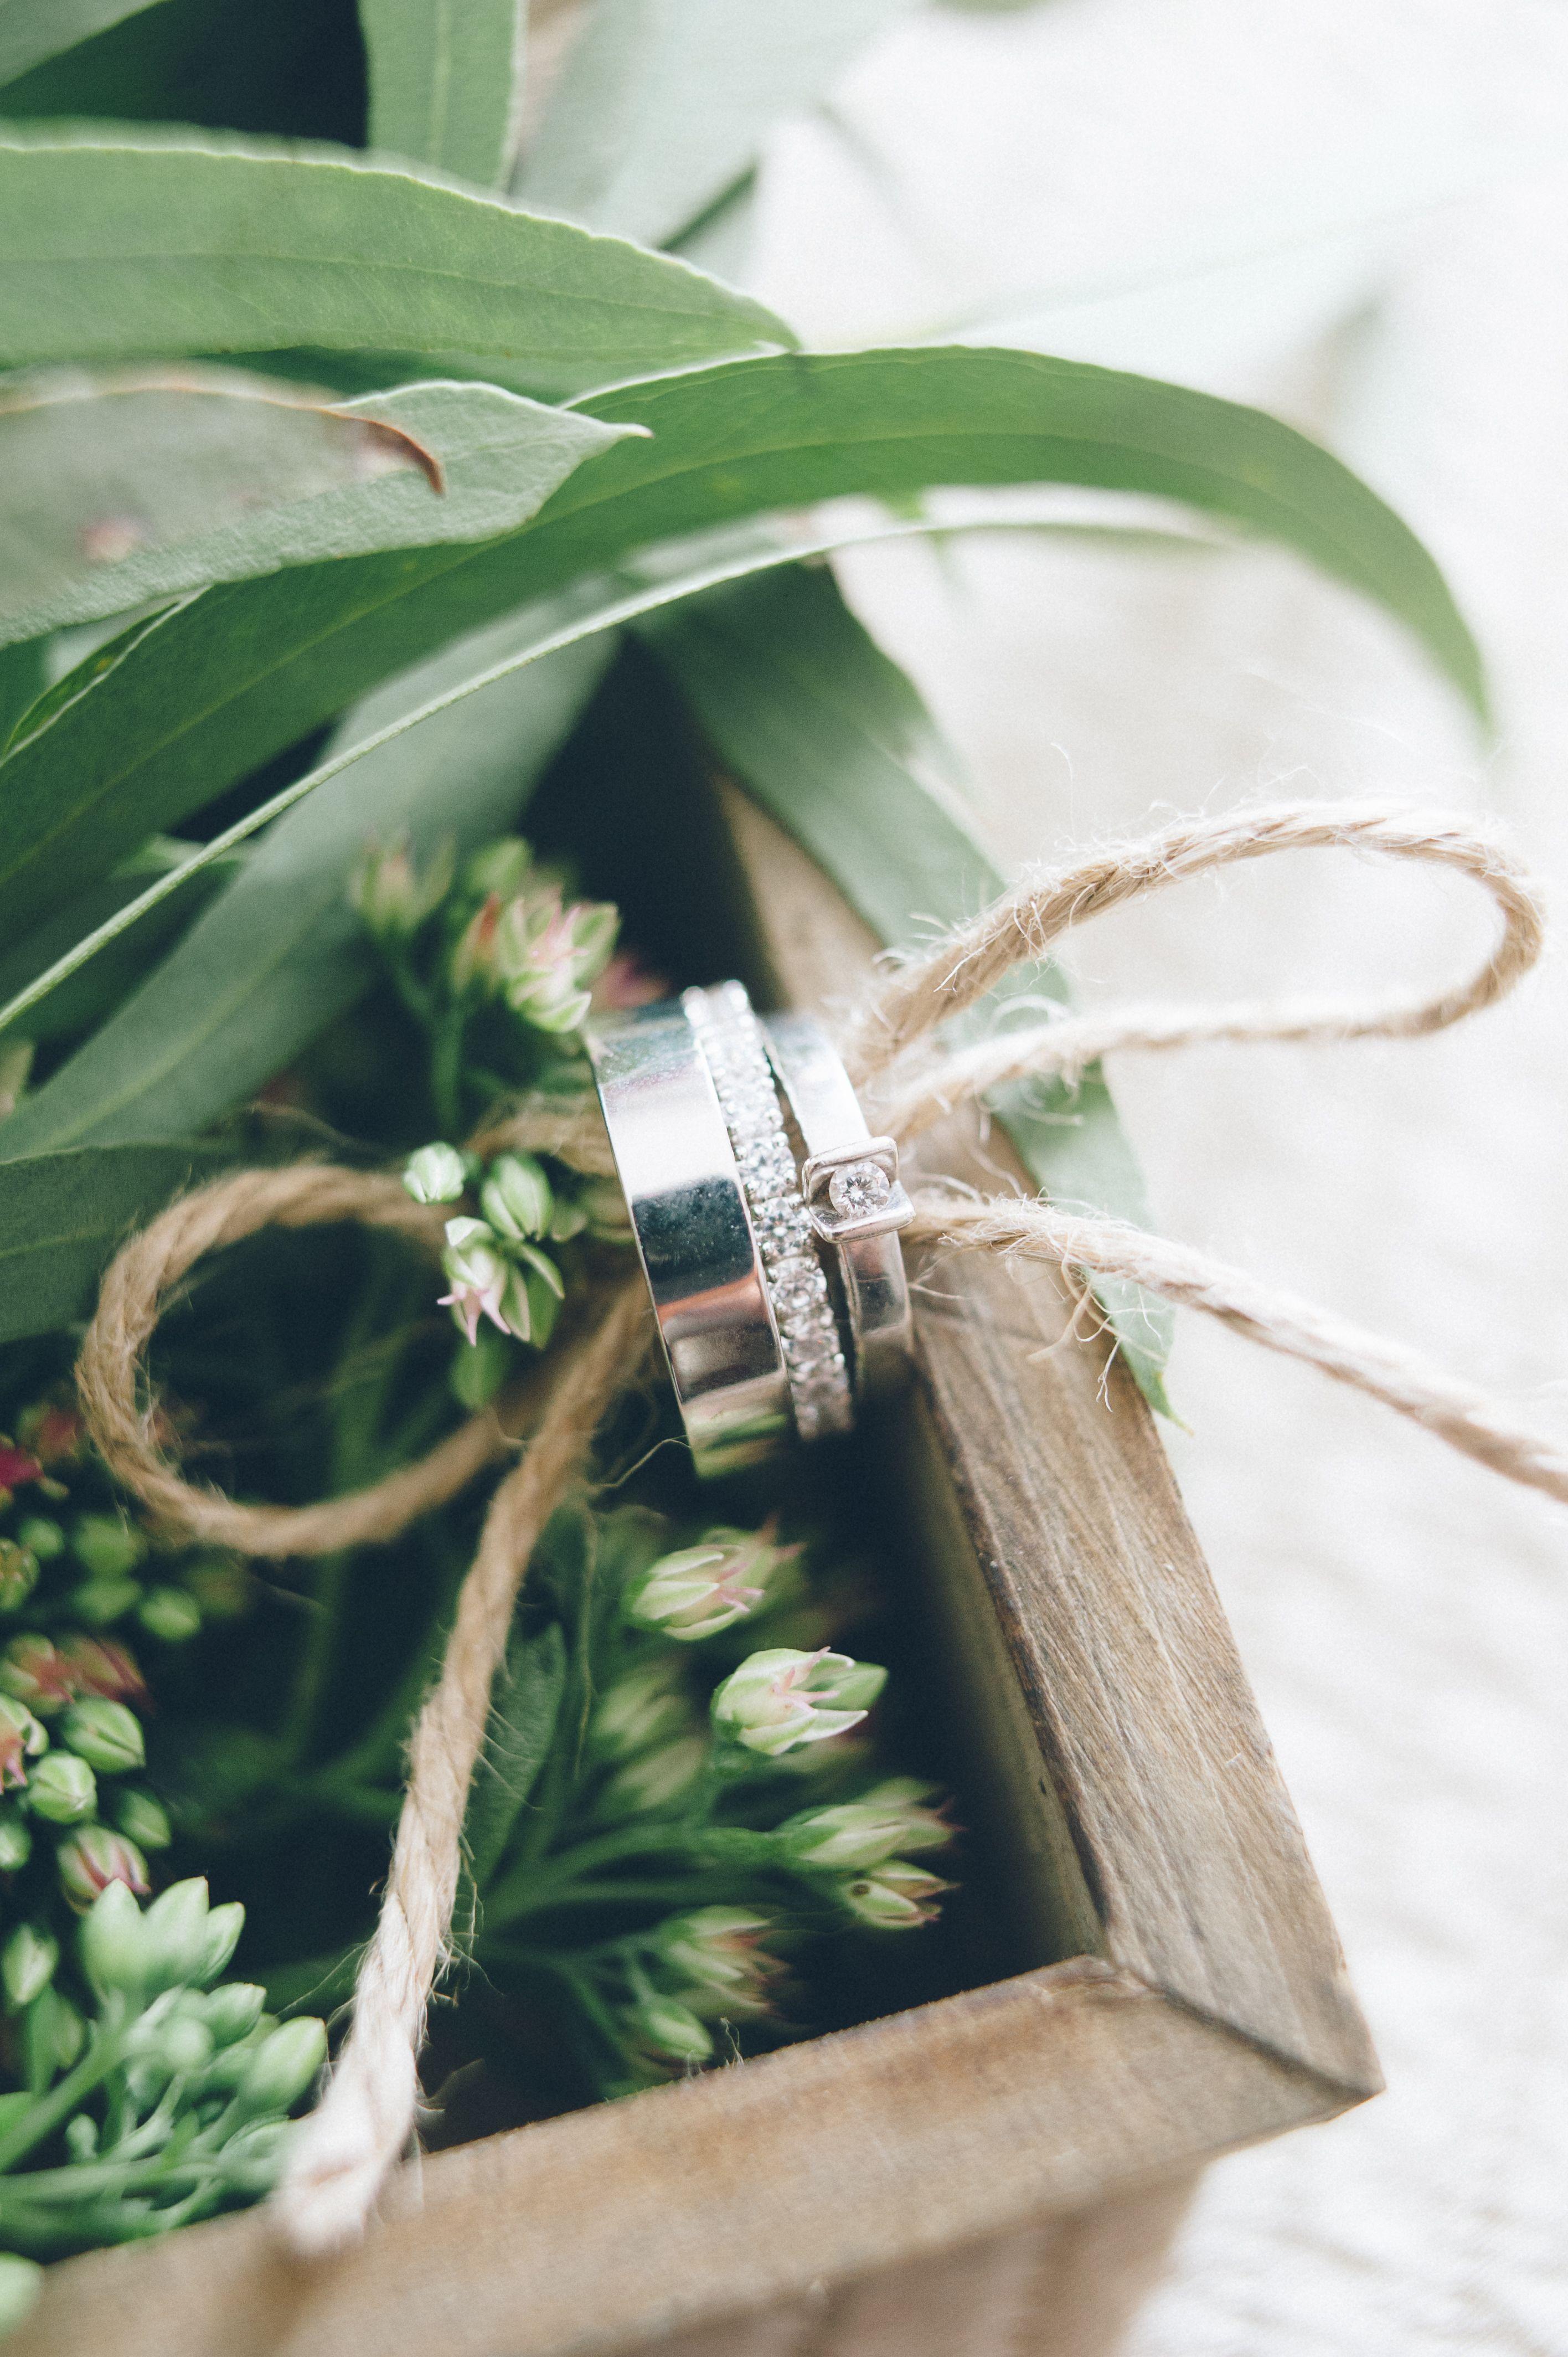 wedding box for rings, wedding ring, greenery flowers wedding, обрчусальные кольца, зелень, флористика, шкатулка, оформление церемонии, свадьба